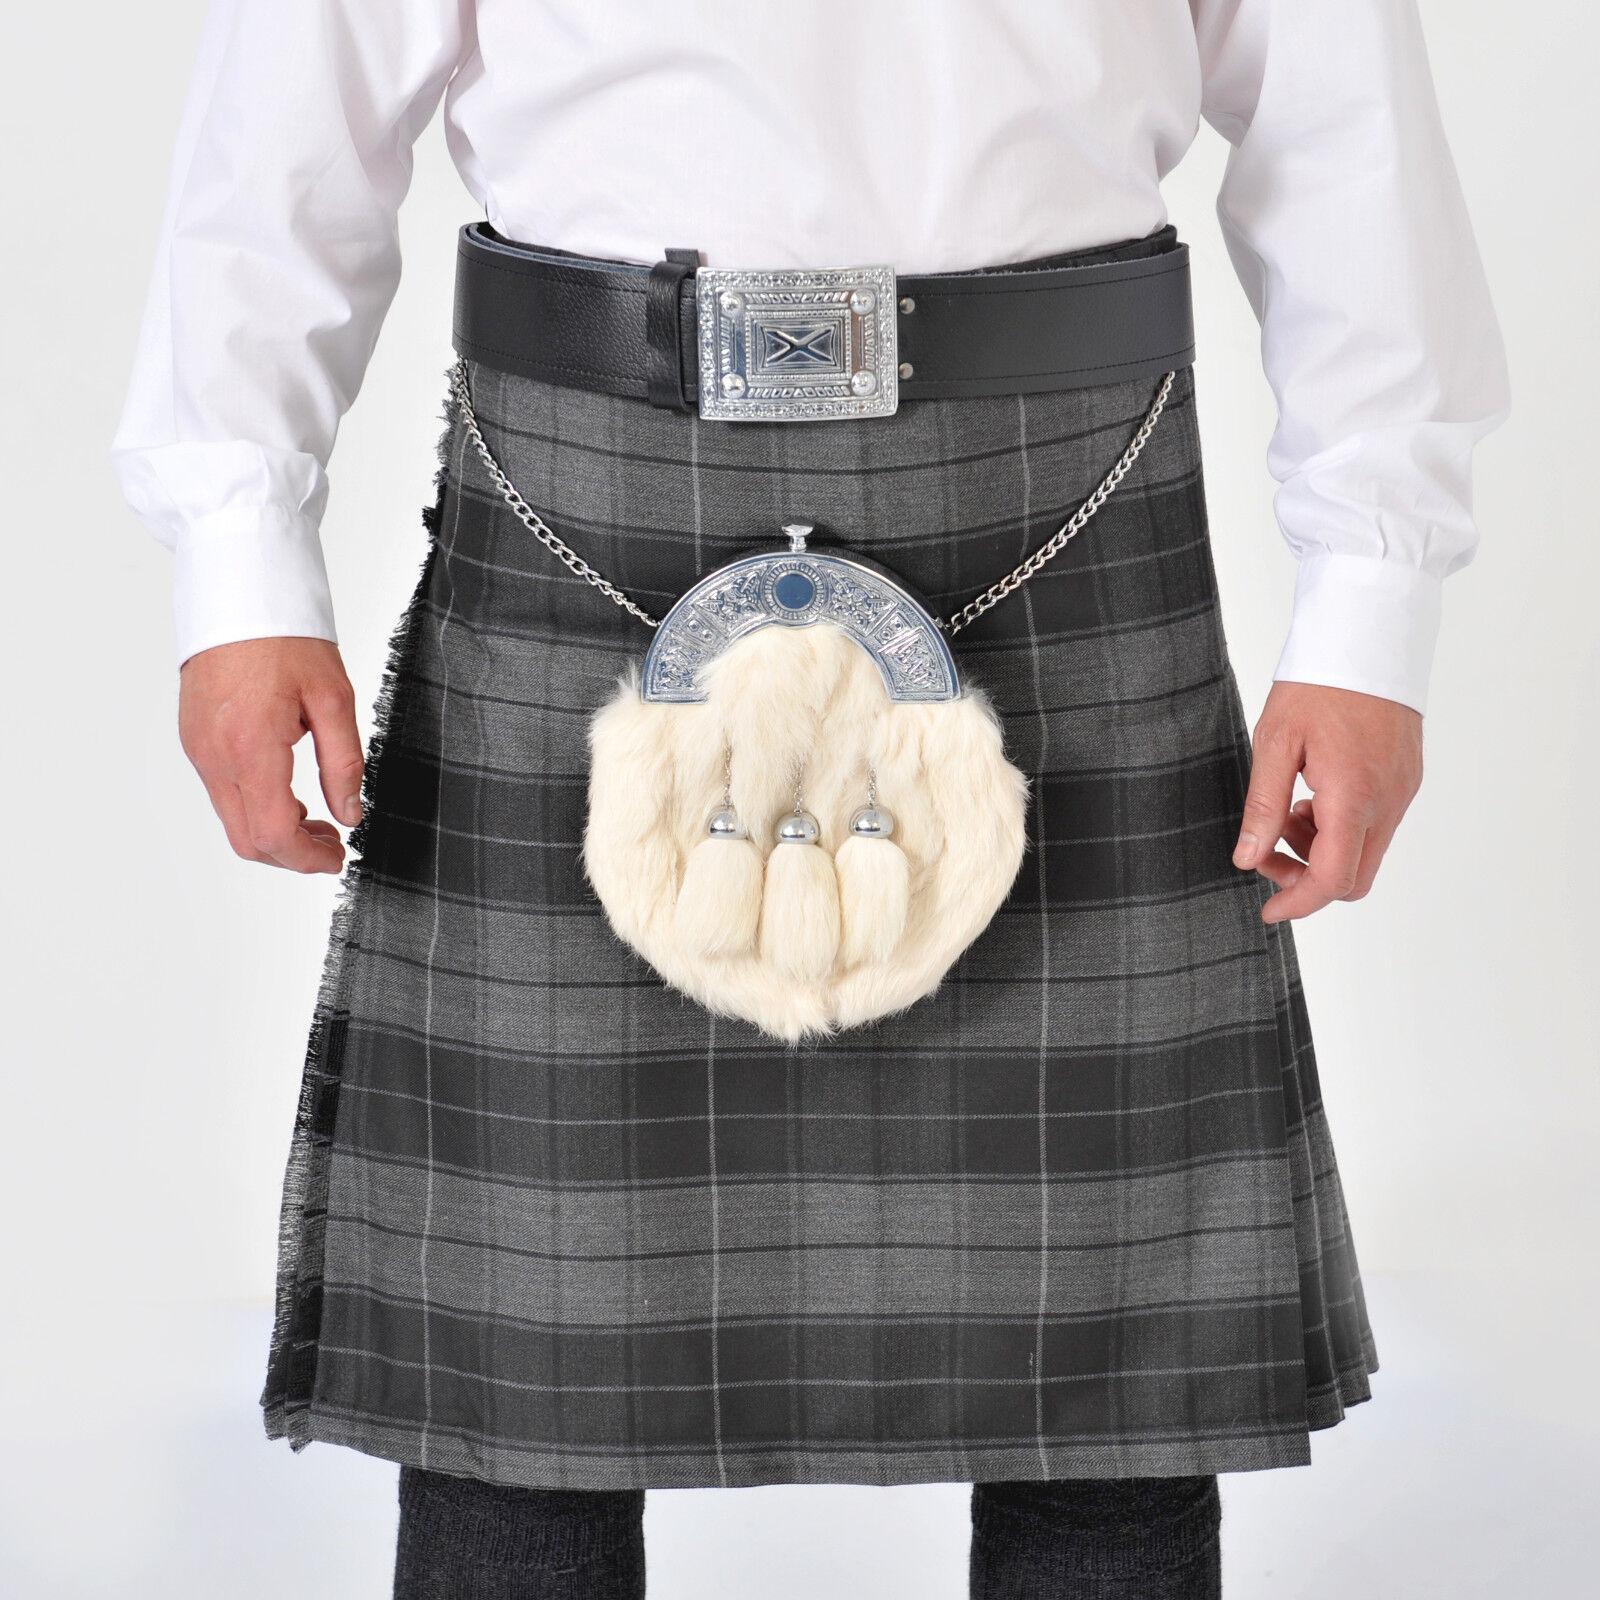 DELUX Chieftain Grey Highlander 8 Yard Polyviscoe KILT - BLACK BUCKLES -